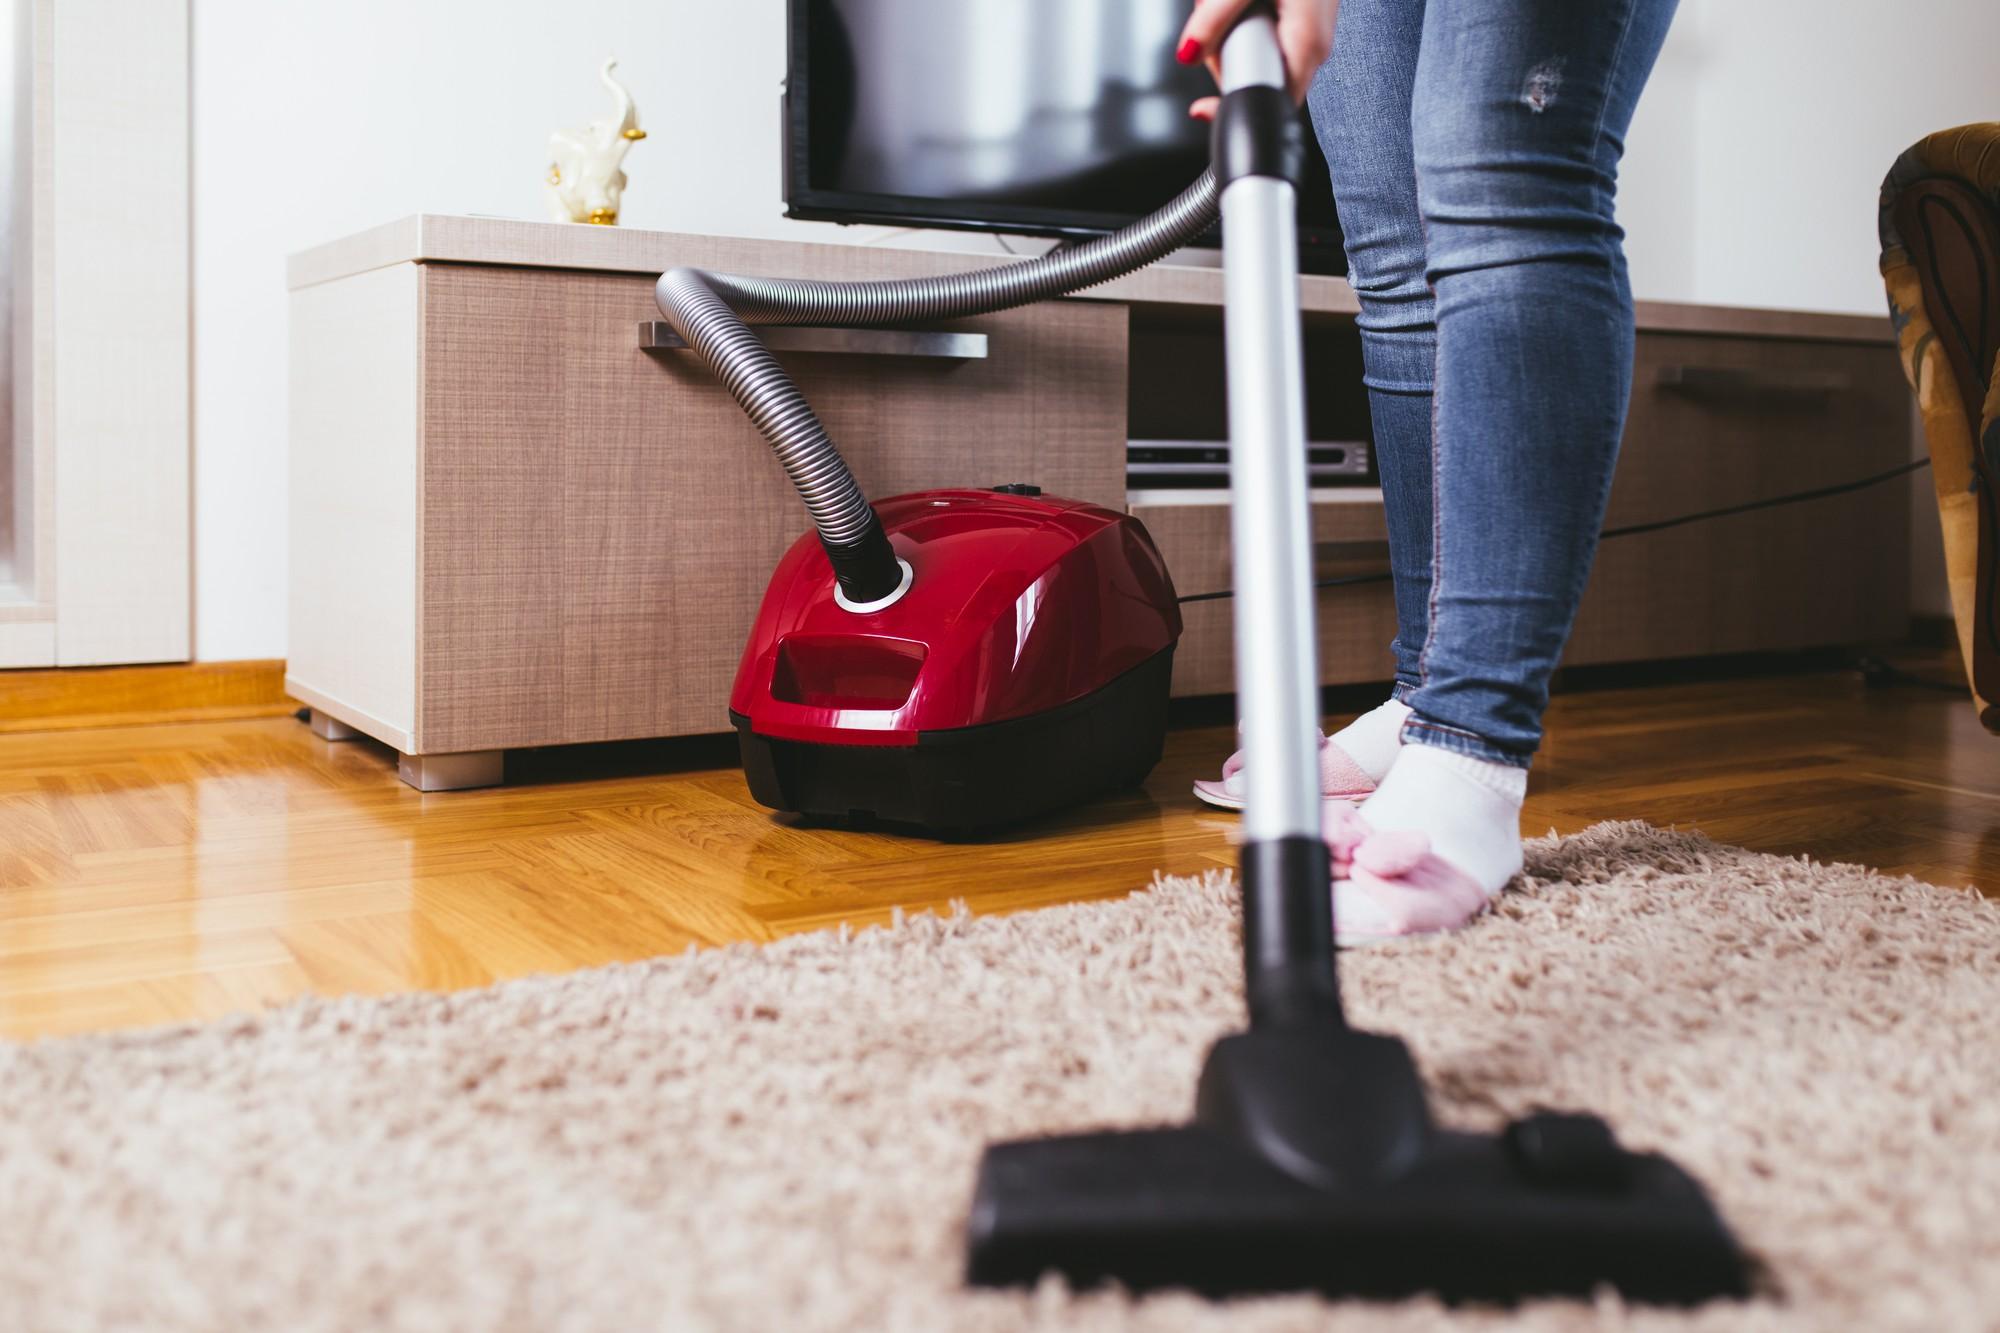 Woman using vacuum cleaner on rug